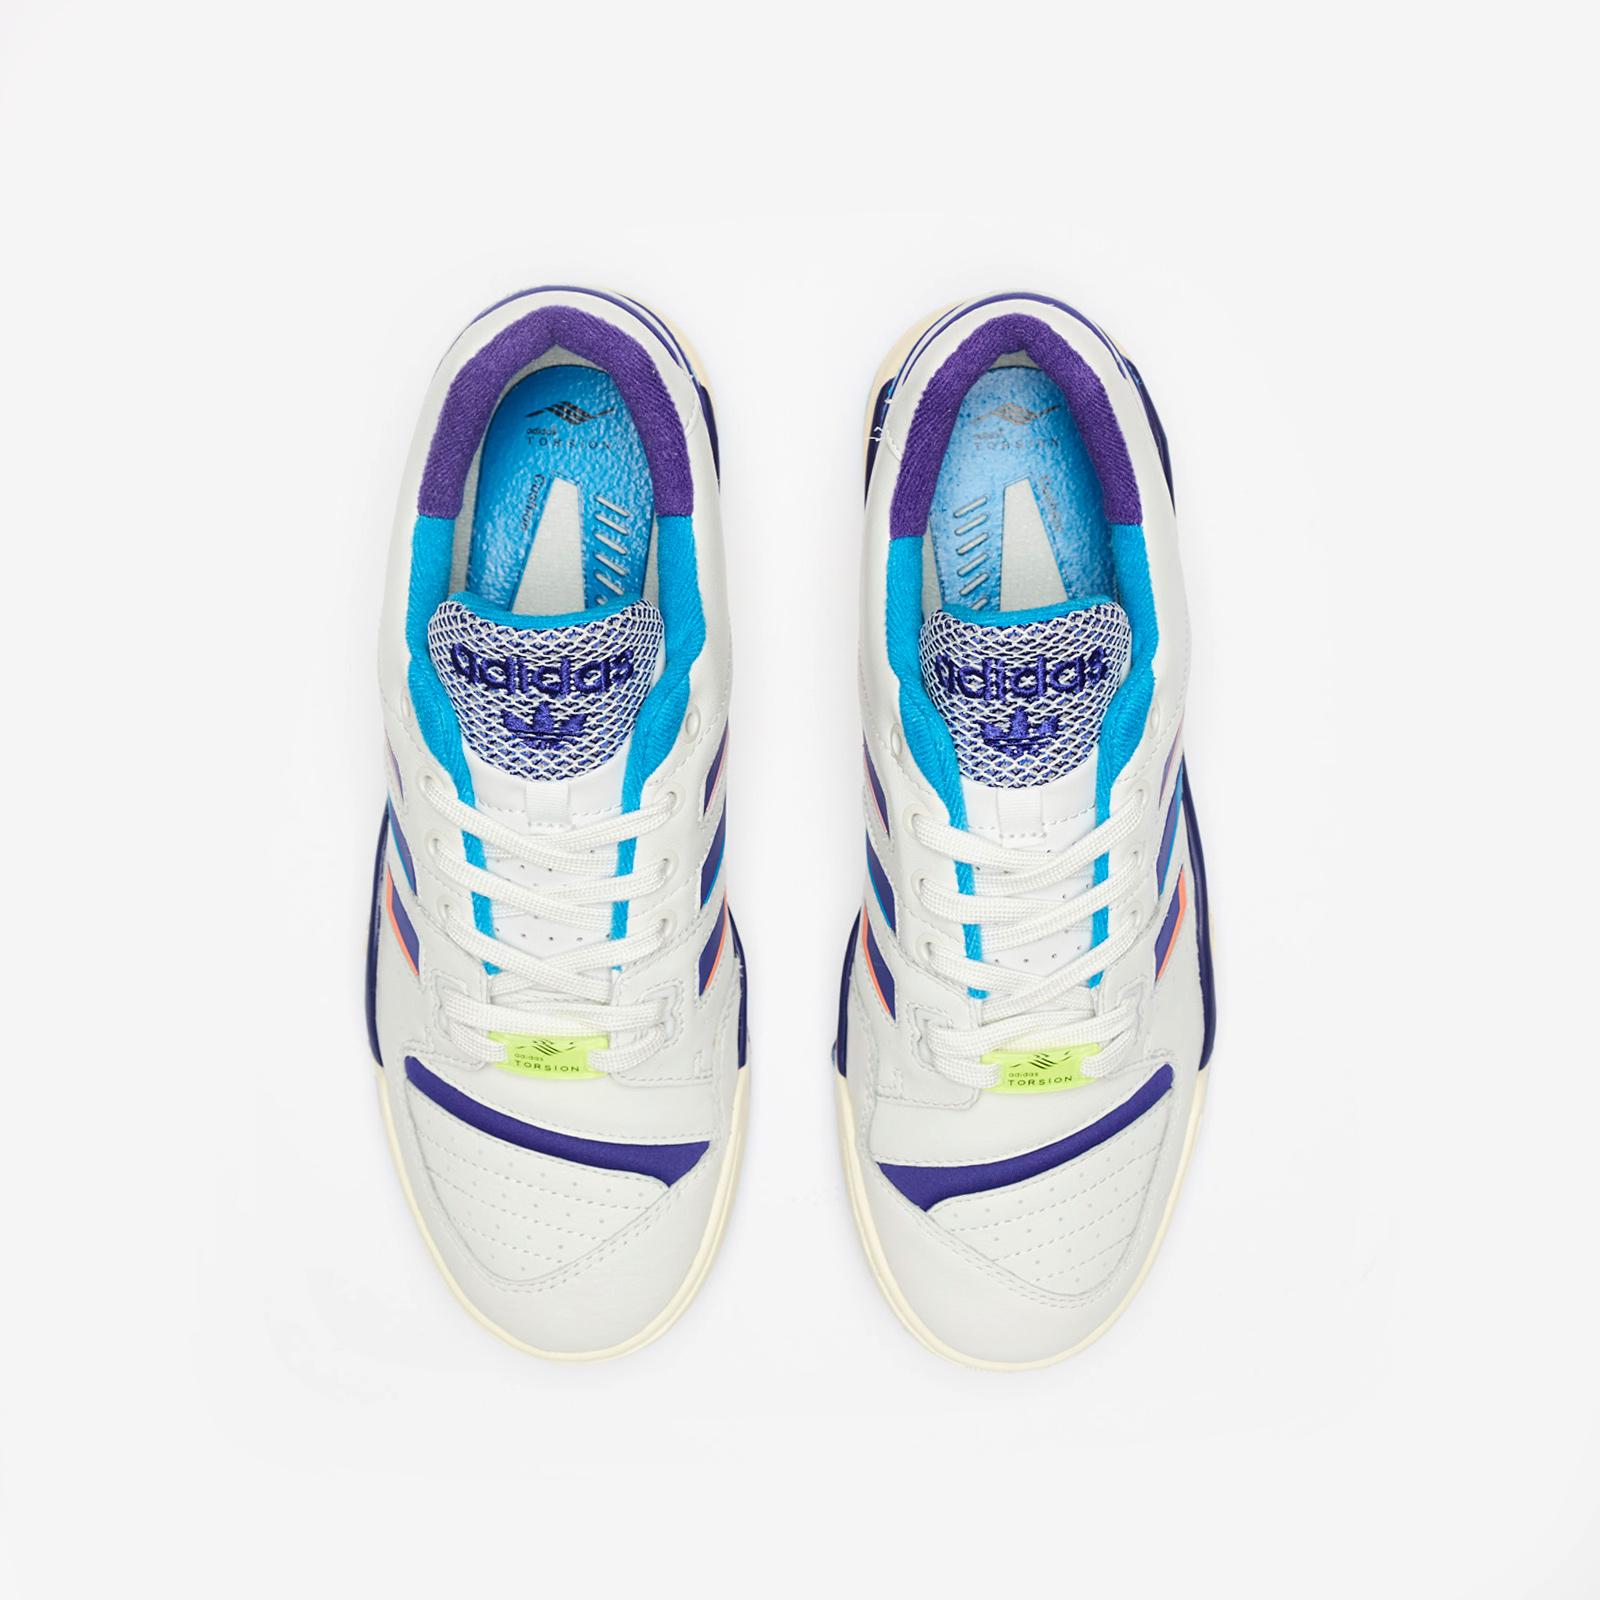 Adidas Herren(Männer) Originals Deerupt Runner Schuhe Karton BraunKarton BraunSchwarz B41763